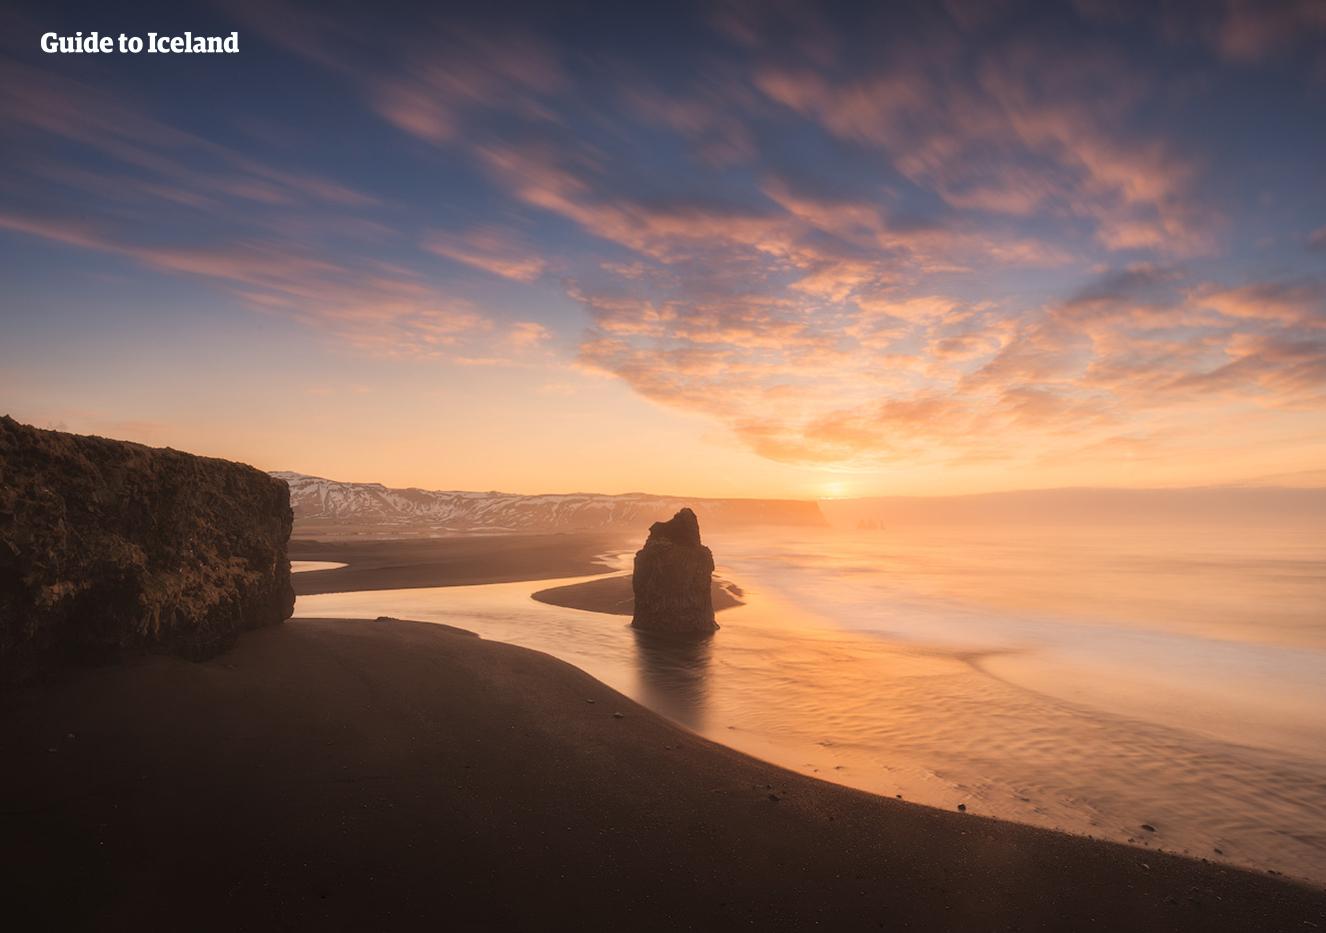 5 Day Summer Self Drive | South Coast & The Highlands with Landmannalaugar - day 2